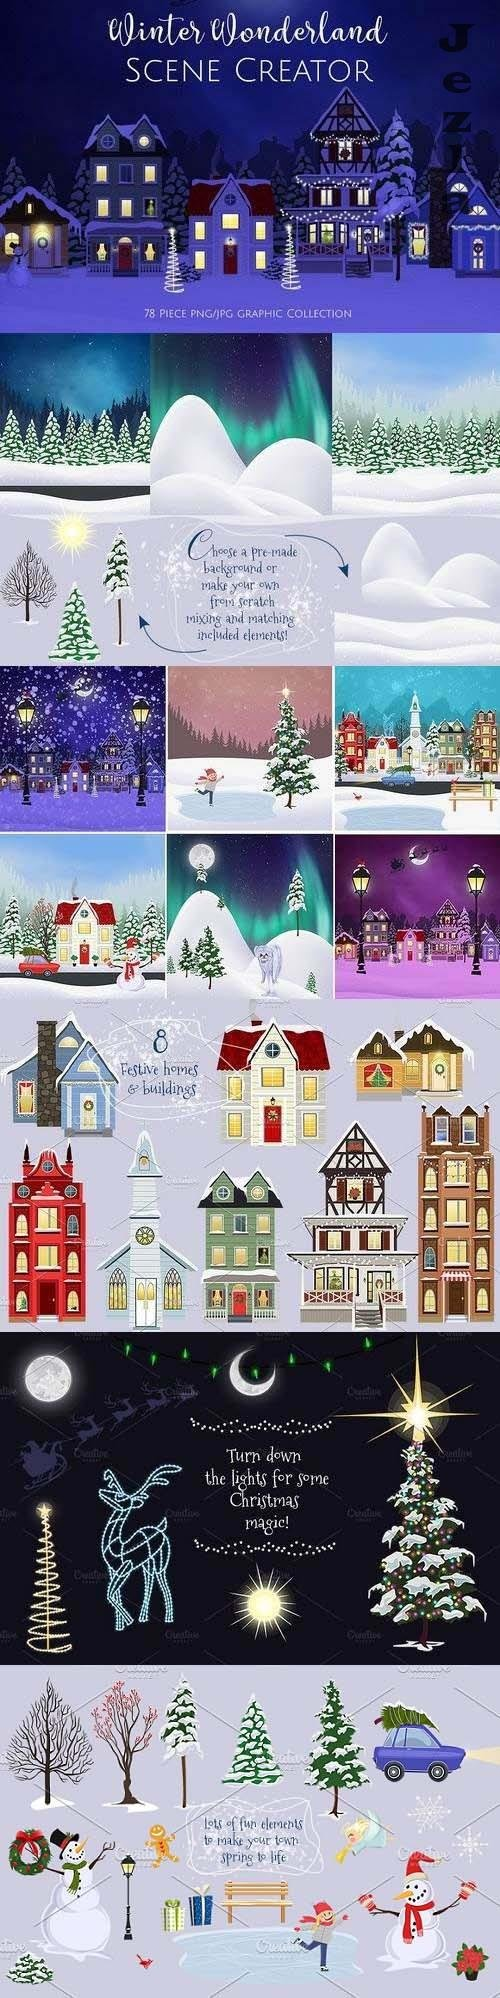 Winter Wonderland Scene Creator - 1982768